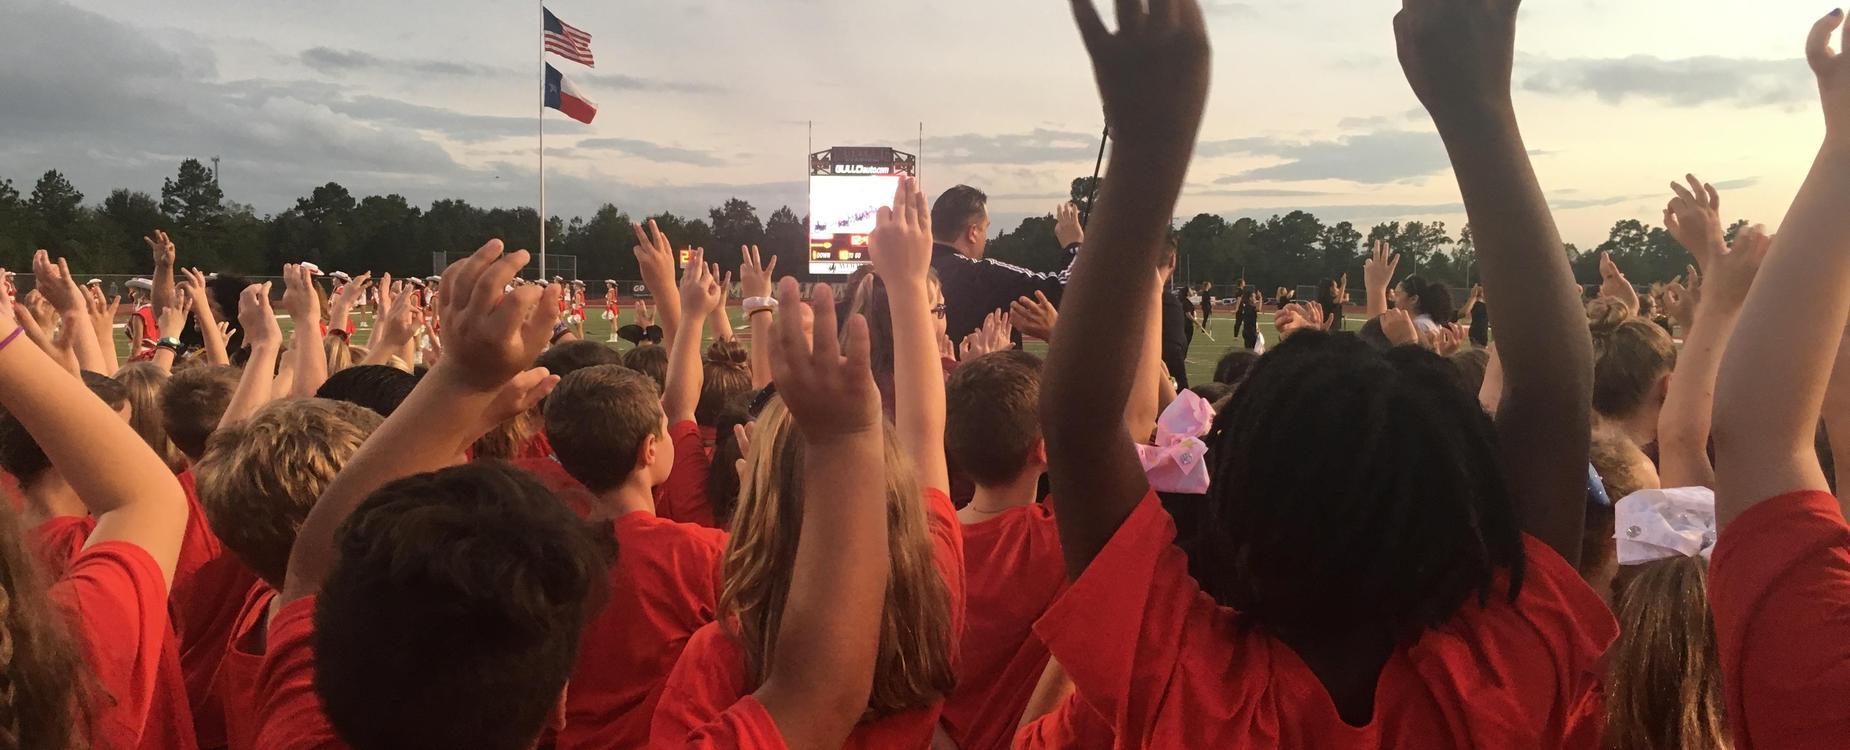 MES Choir at a West football game